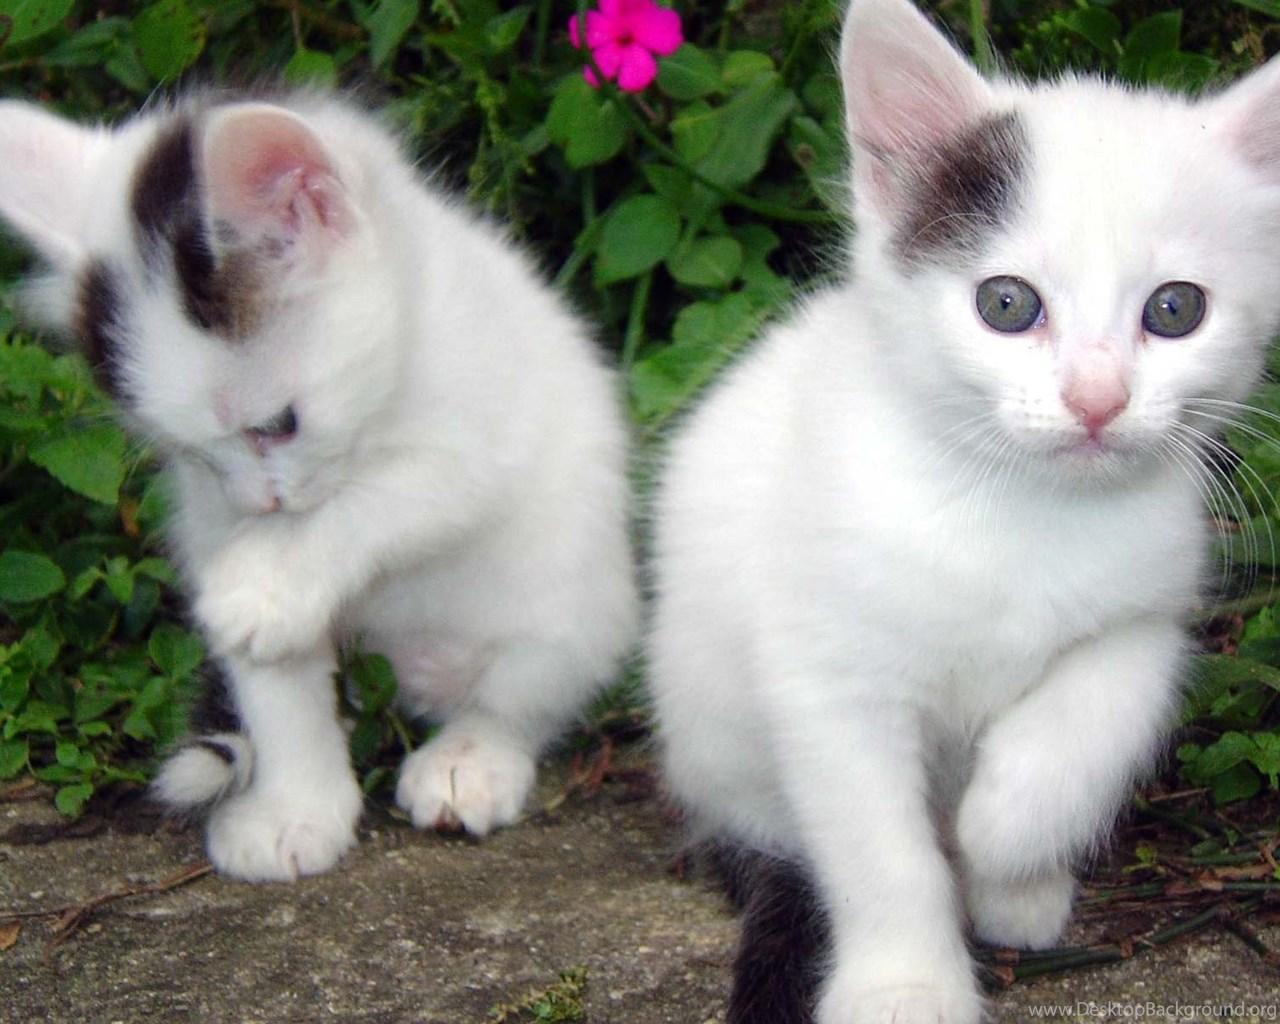 Cute White Baby Cats Wallpaper Jpg M 1390822827 Desktop Background